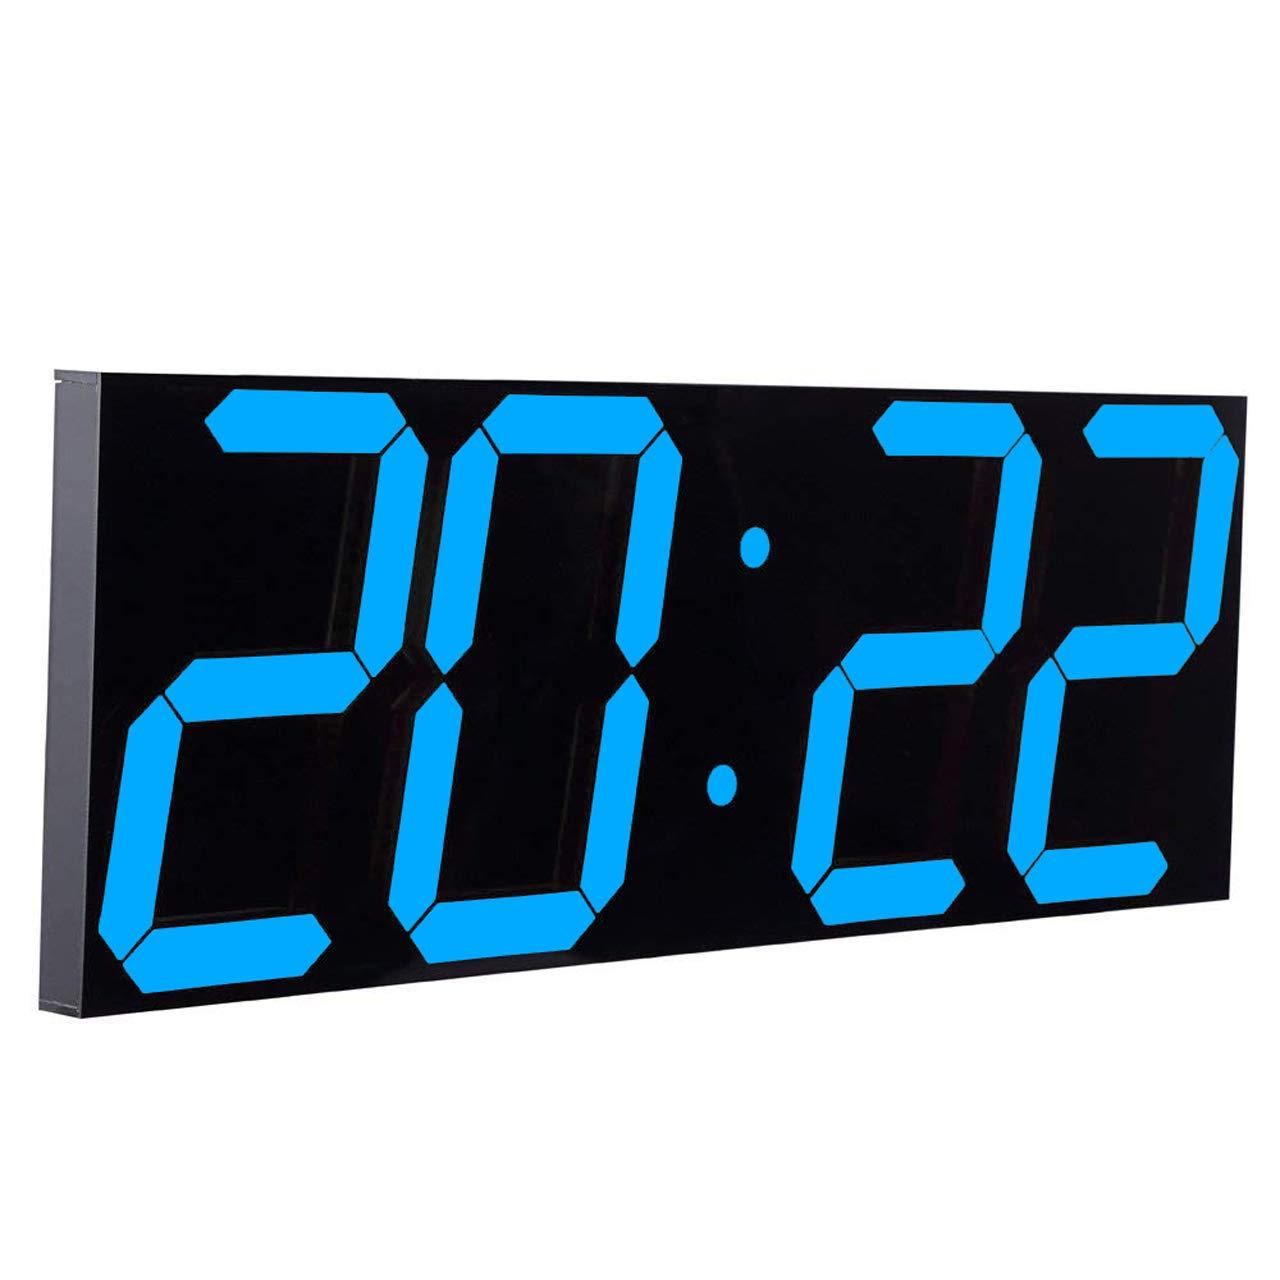 CHKOSDA Remote Control Jumbo Digital Led Wall Clock, Multifunction Led Clock, Large Calendar, Minute Alarm Clock, Countdown Led Clock, Big Thermometer, Mute Clock (Ice Blue)